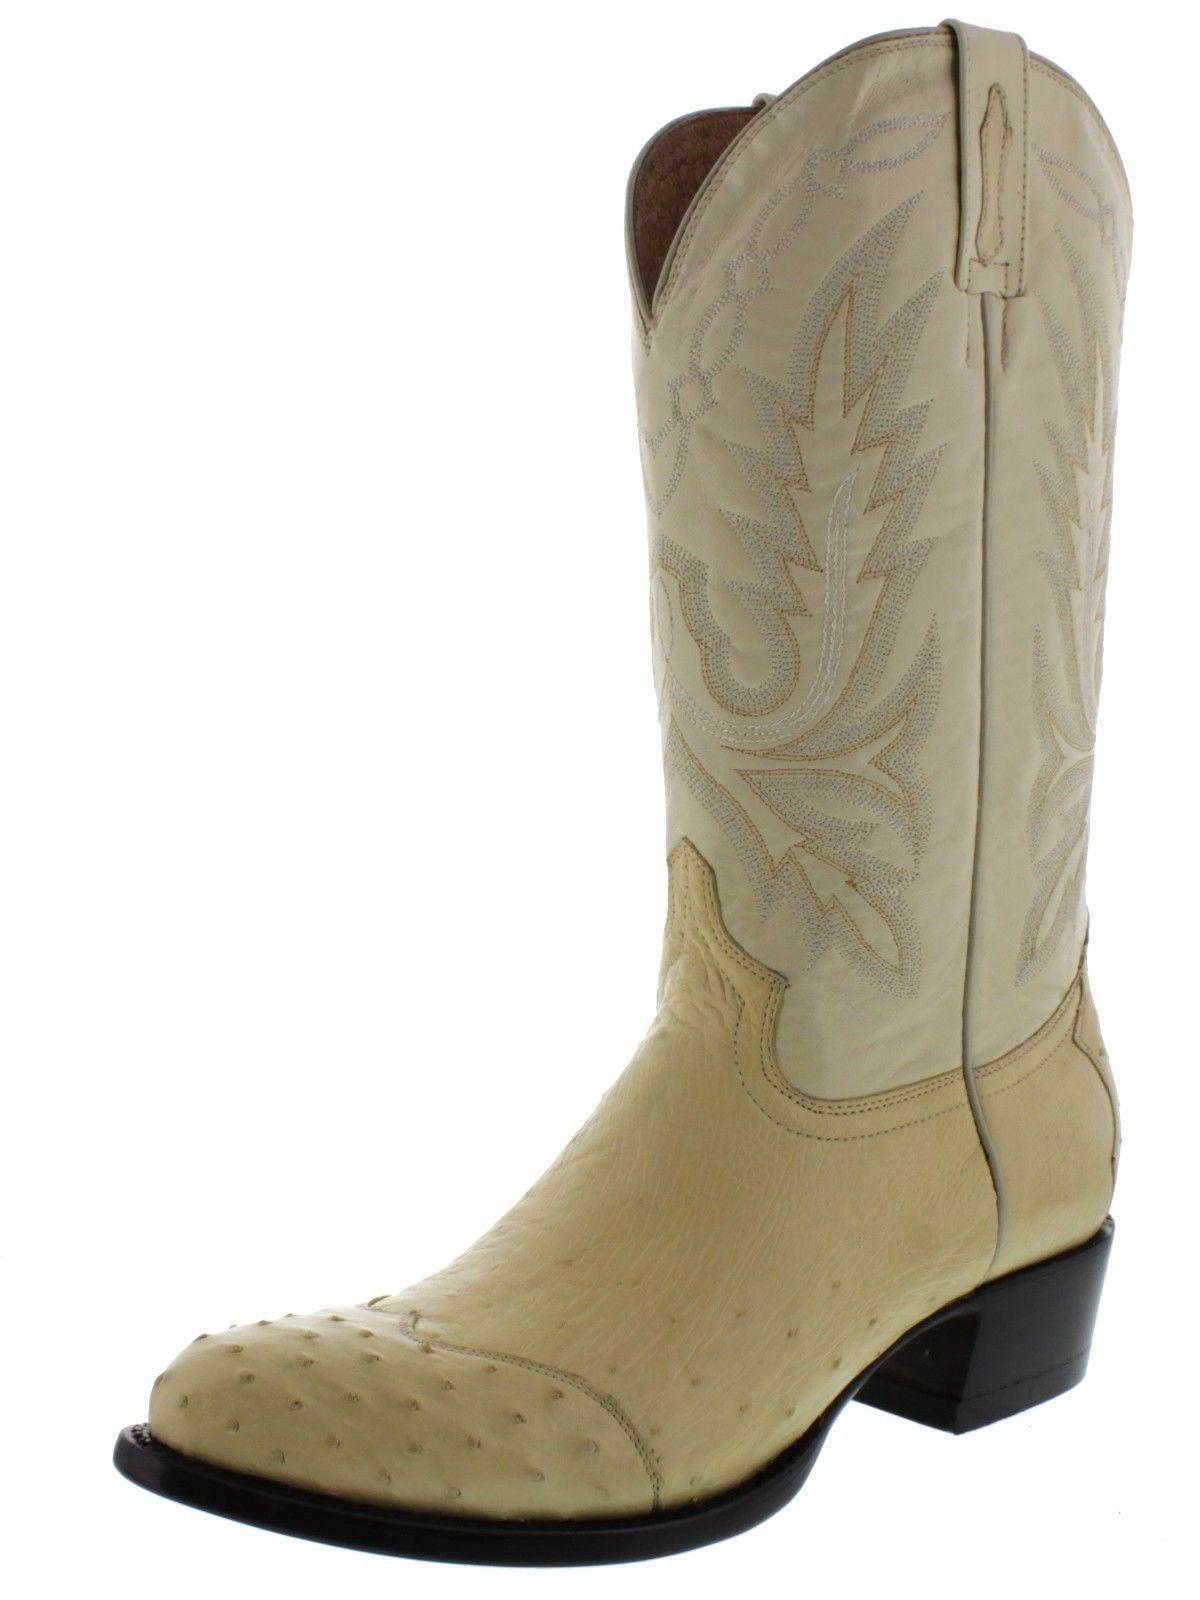 Men's genuine ostrich skin cowboy boots off white wing tip round toe western